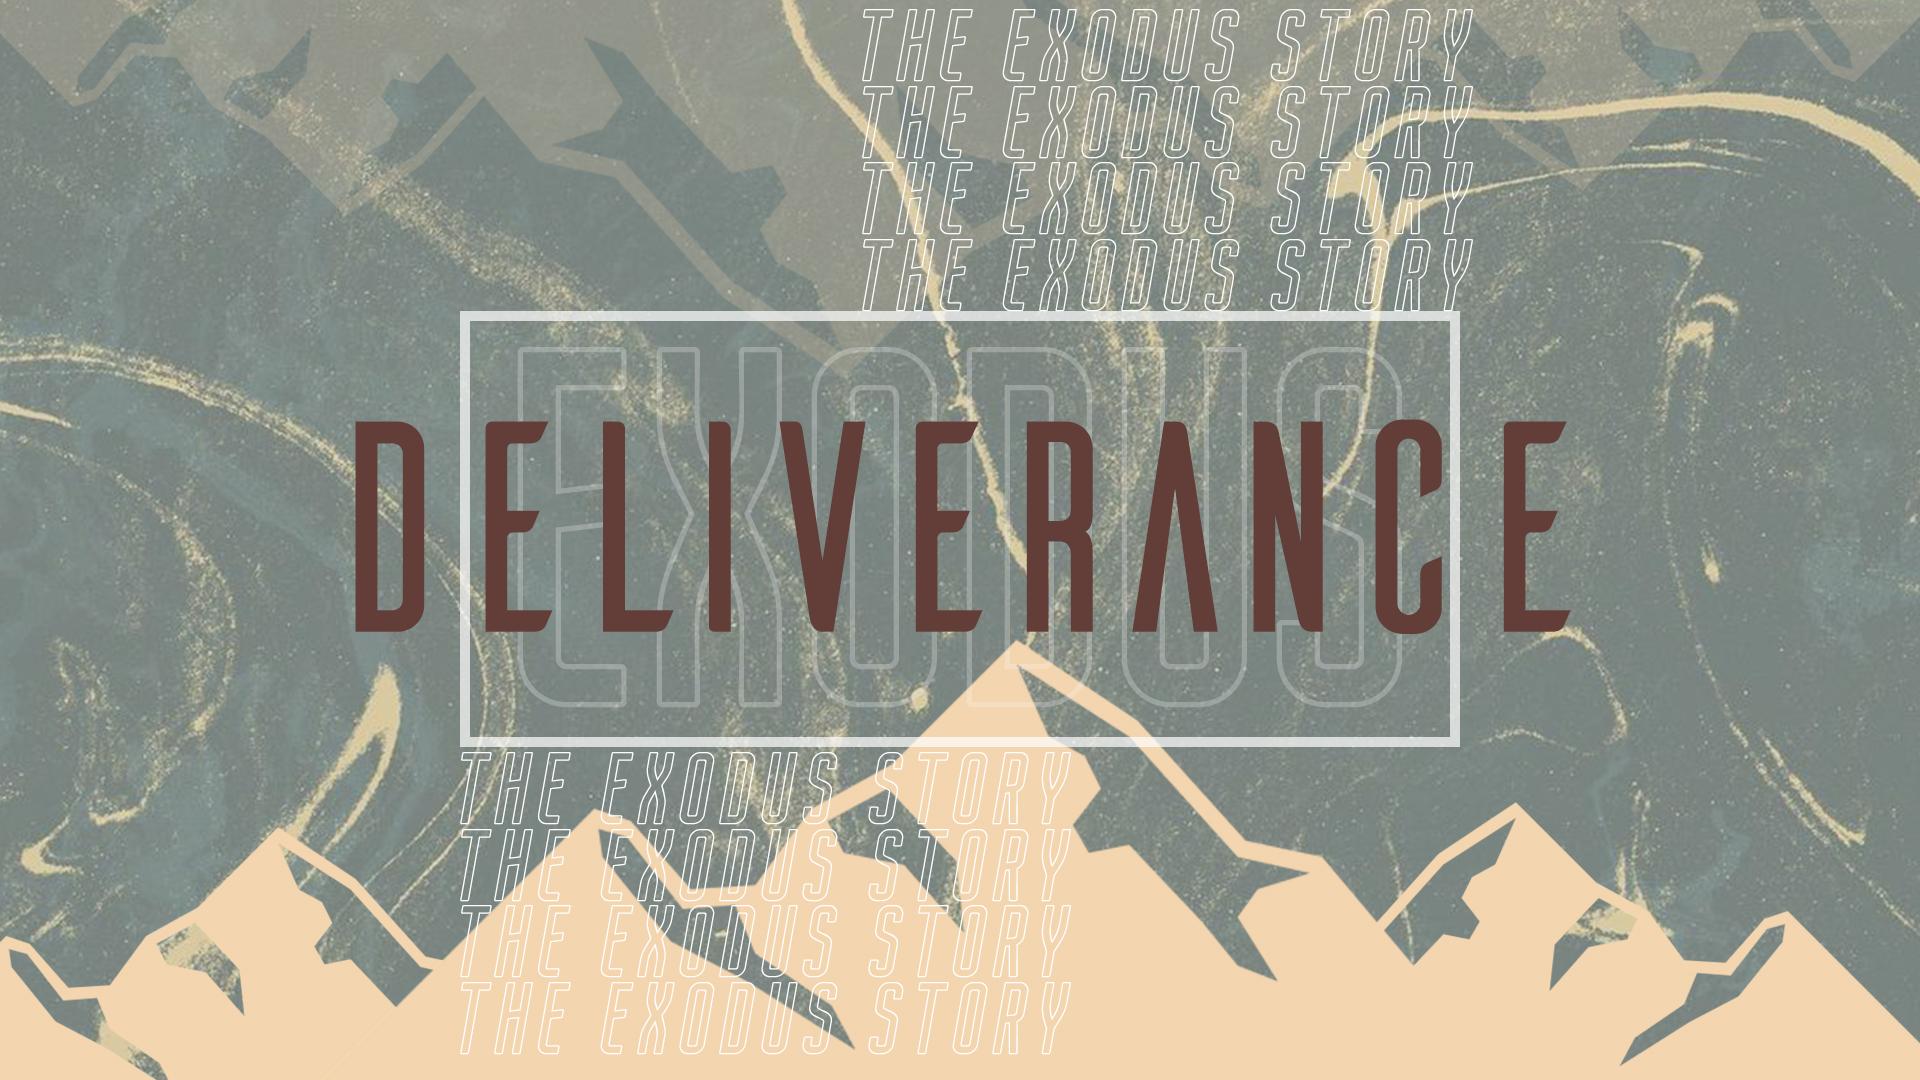 deliverance_sunday_worship_service_klesis_berkeley